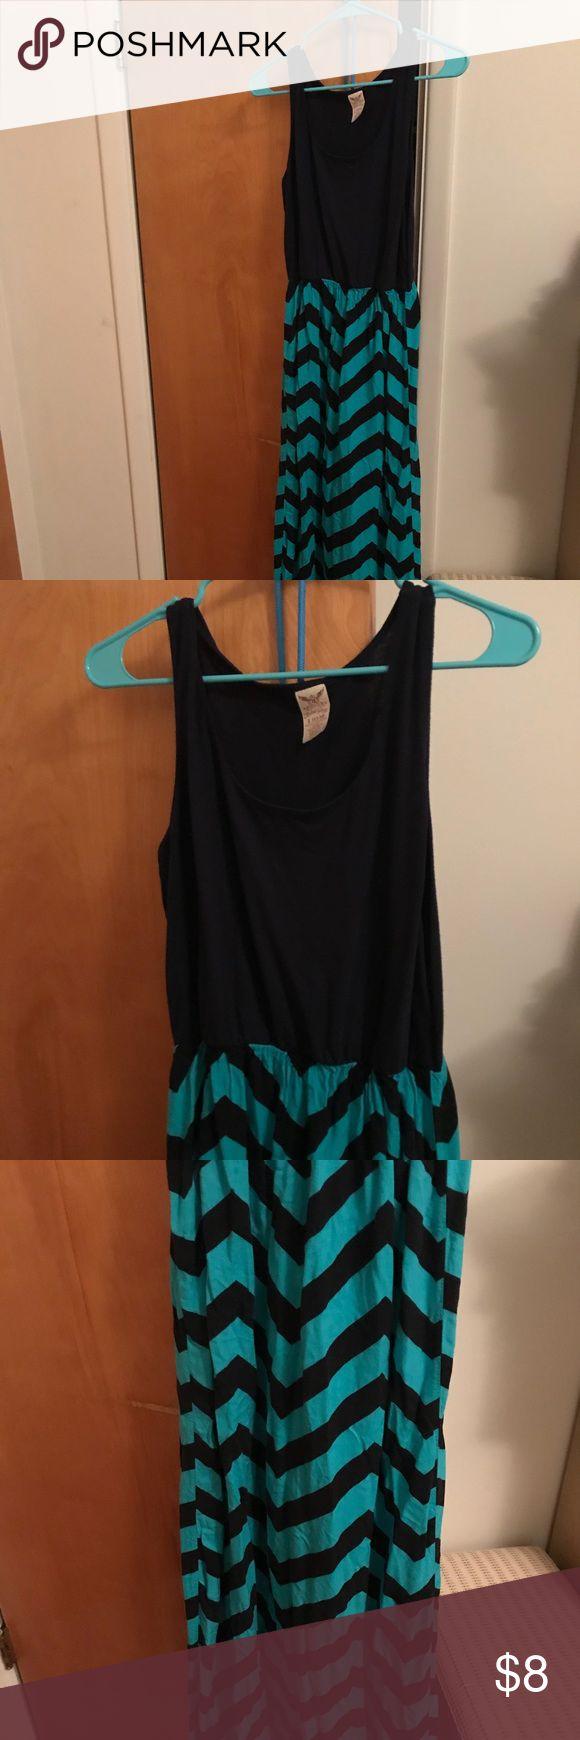 💙 Faded Glory Blue & Turquoise Maxi Dress Large Adorable maxi dress! So comfy and cute! 💙💙💙 Faded Glory Dresses Maxi